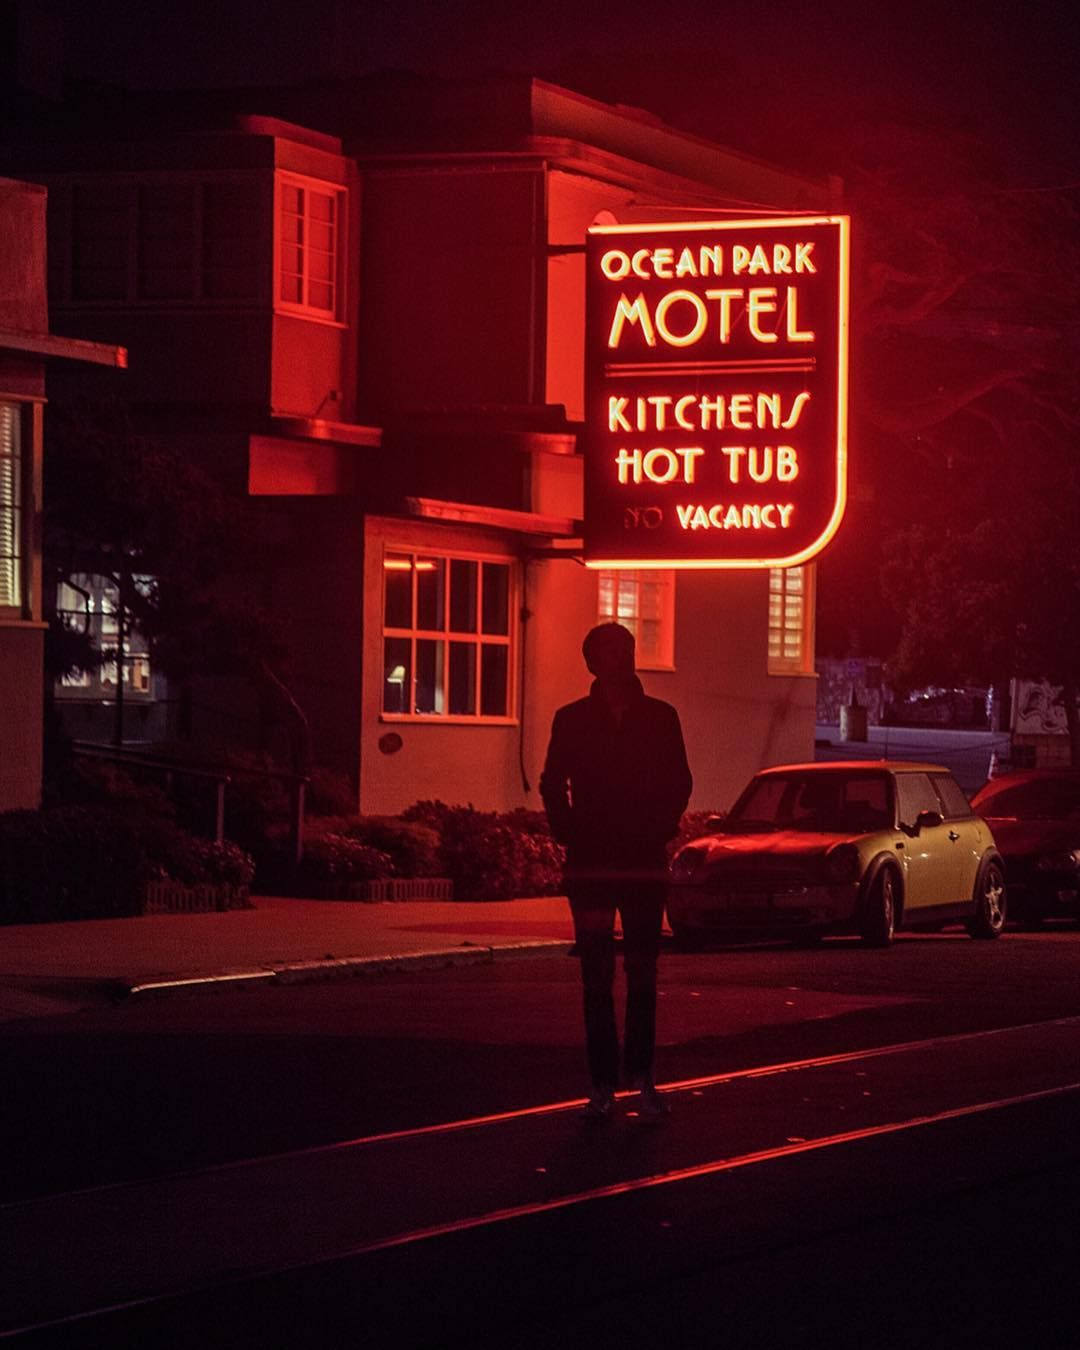 Ocean Park Motel By Mina Seville